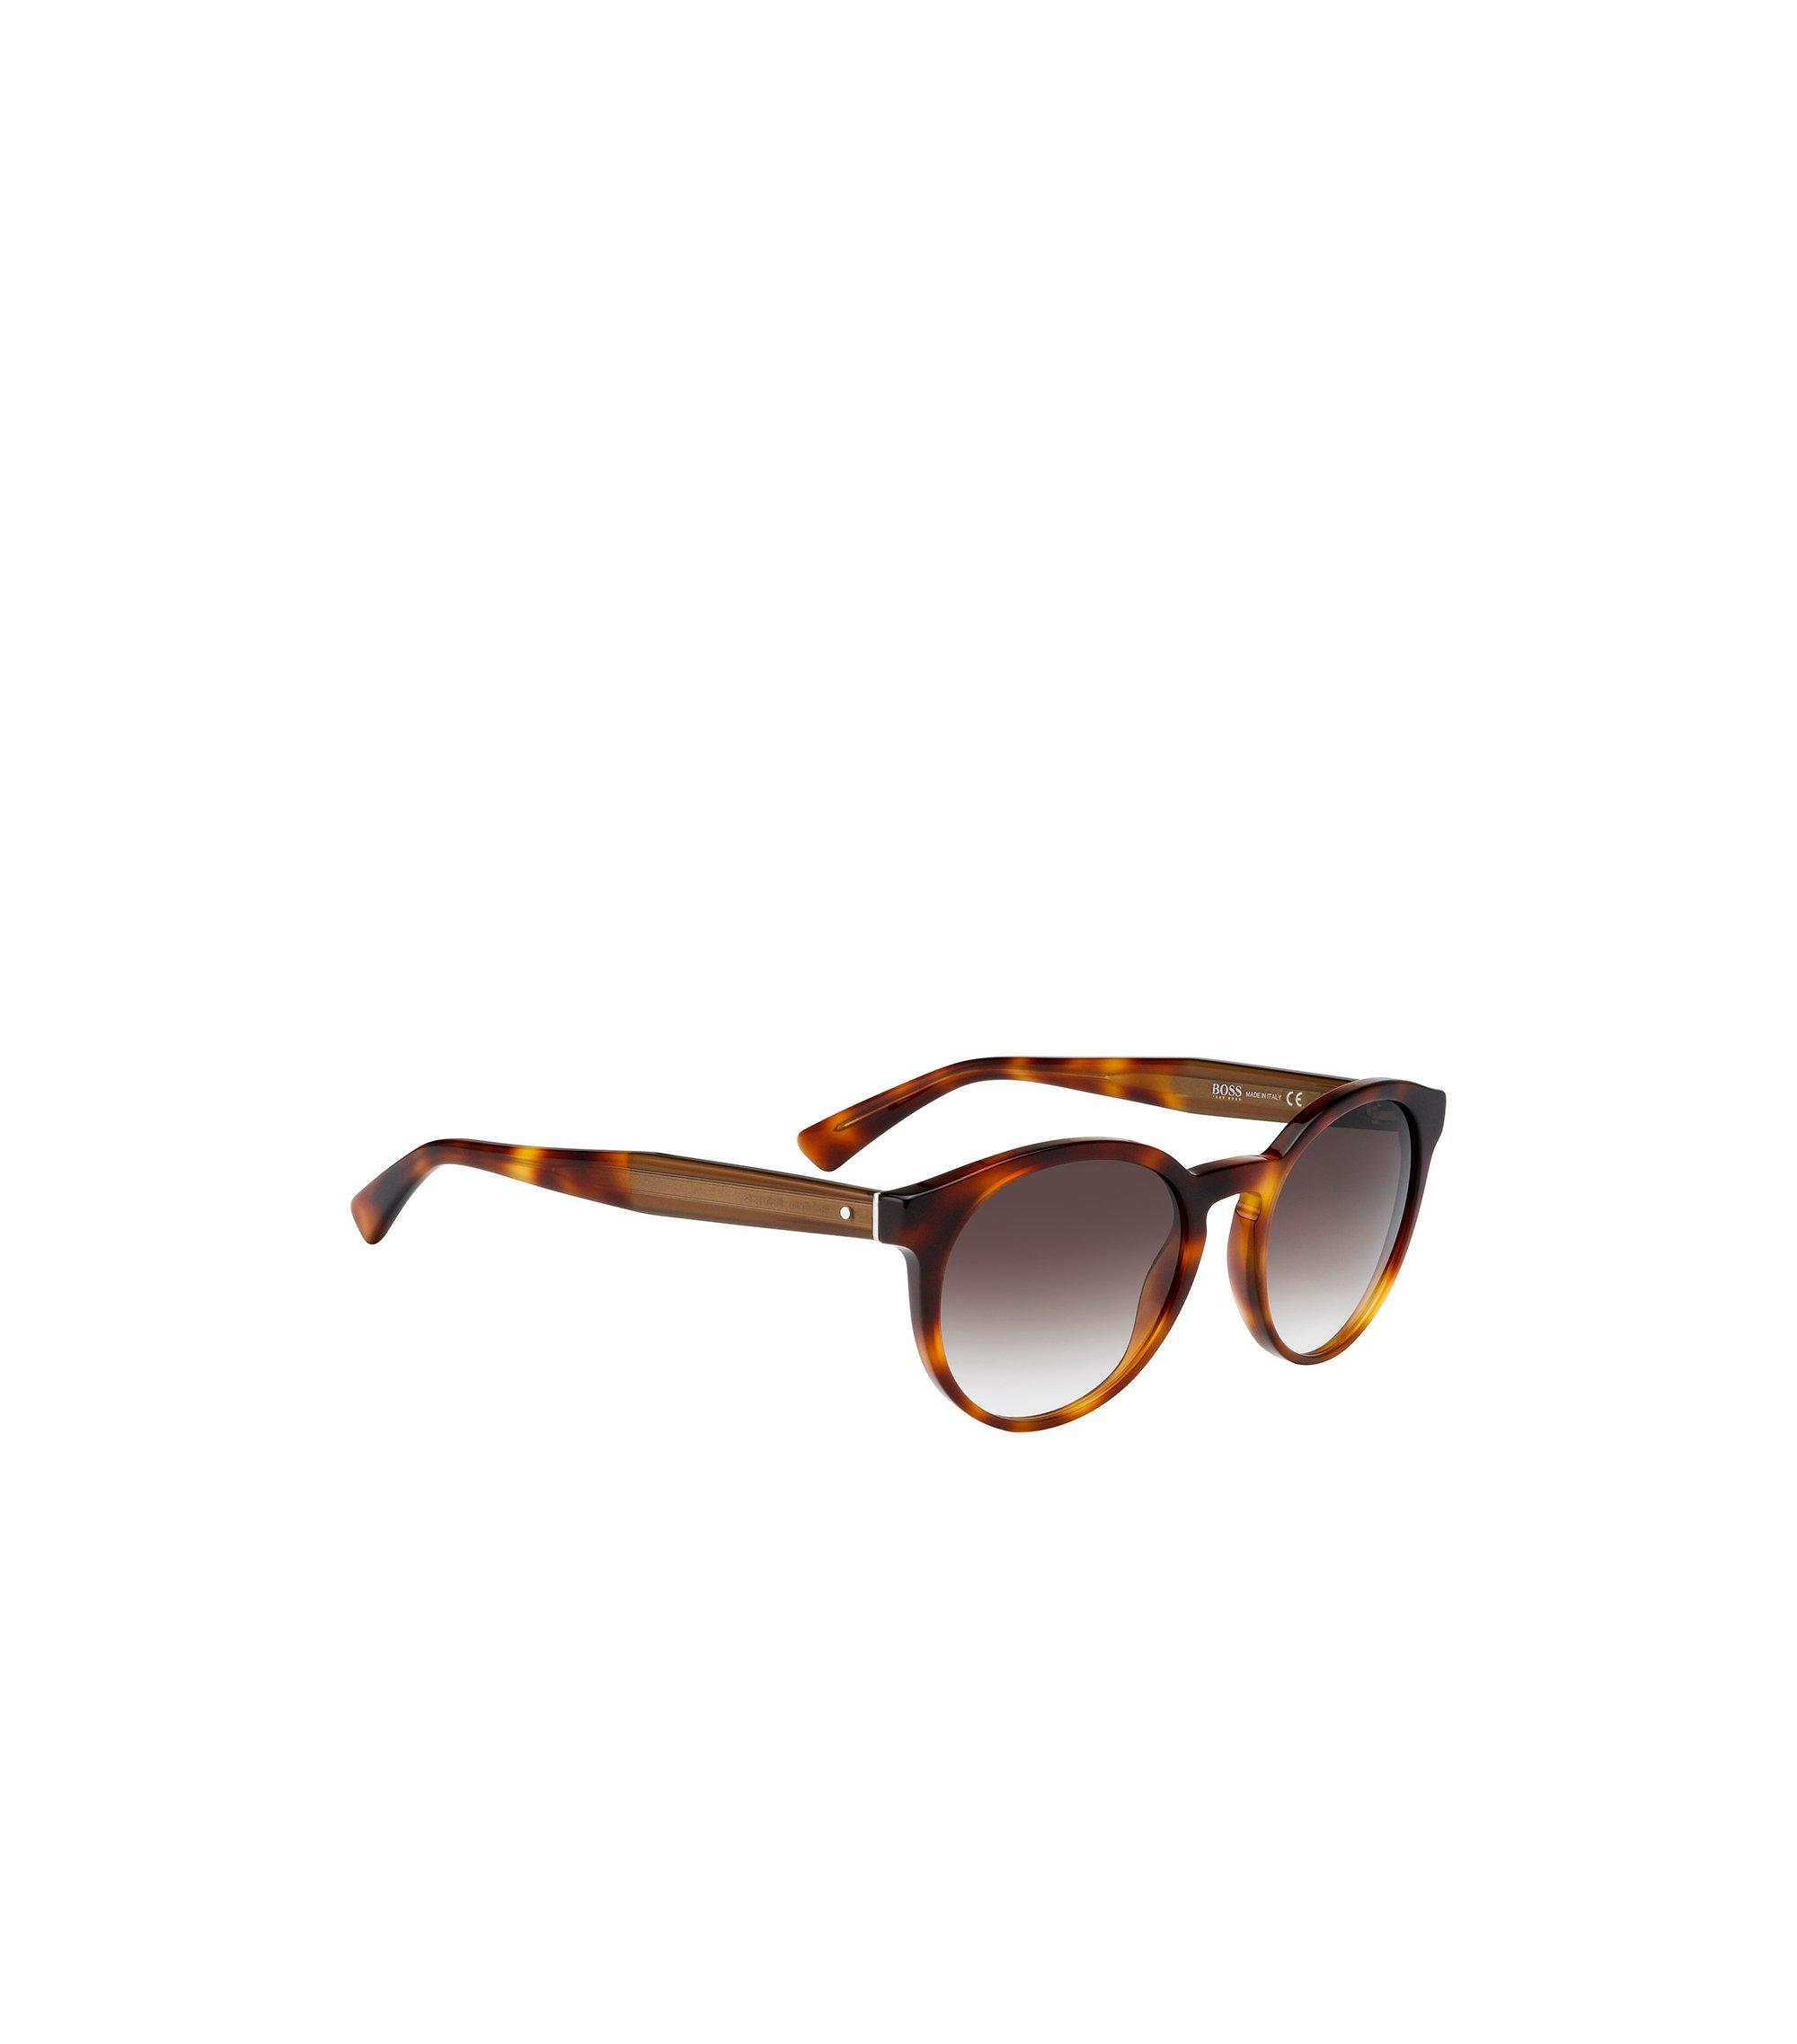 Bruine zonnebril in pantostijl: 'BOSS 0794/S', Assorted-Pre-Pack